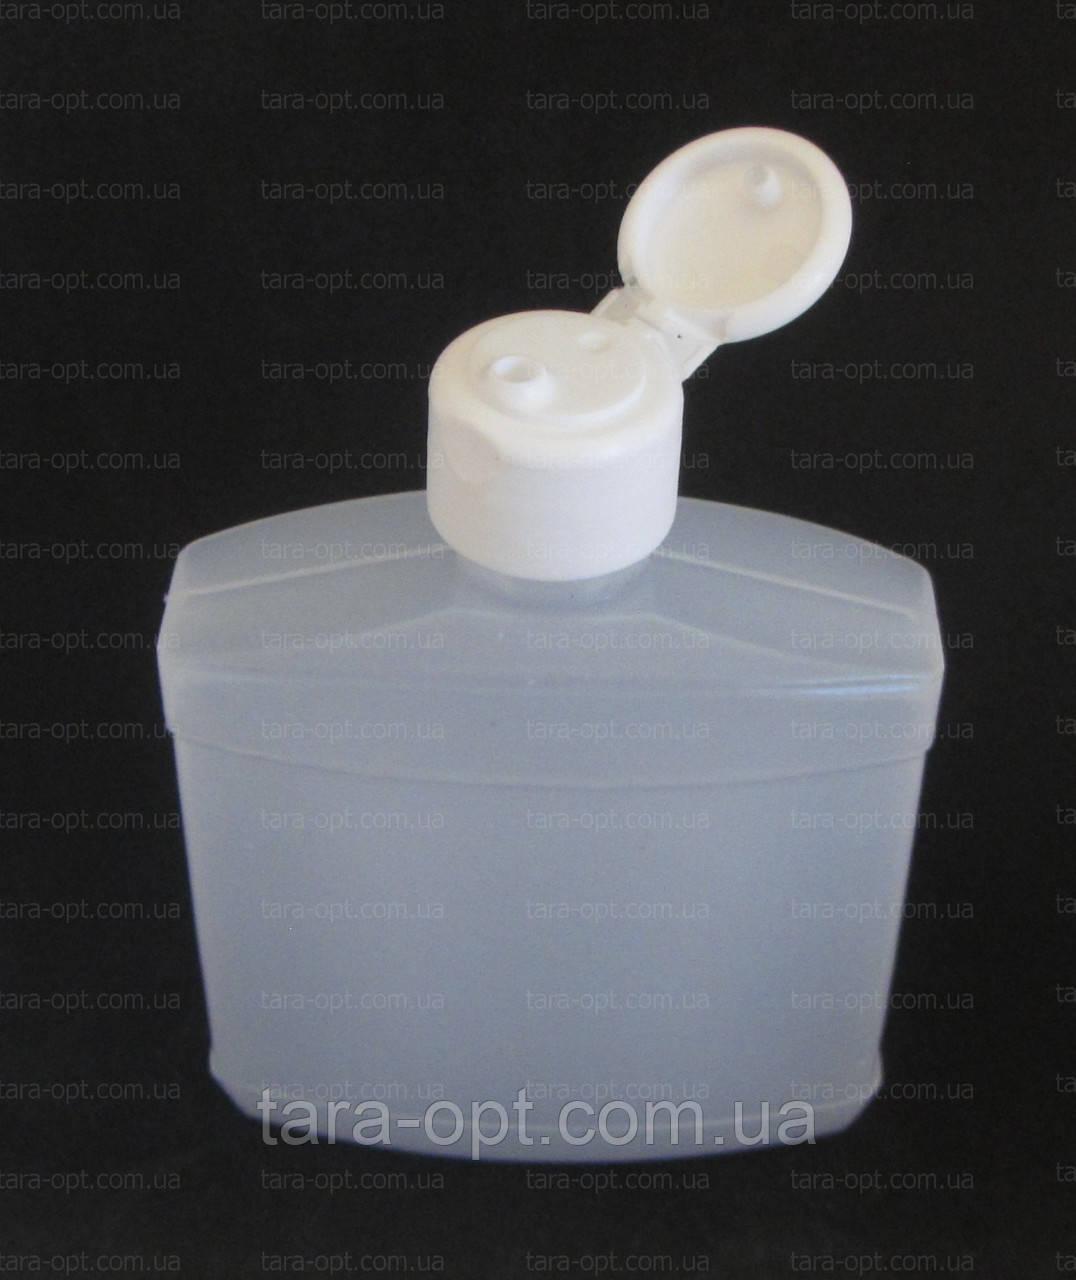 Флакон-дозатор антисептика 100 мл Flip-top